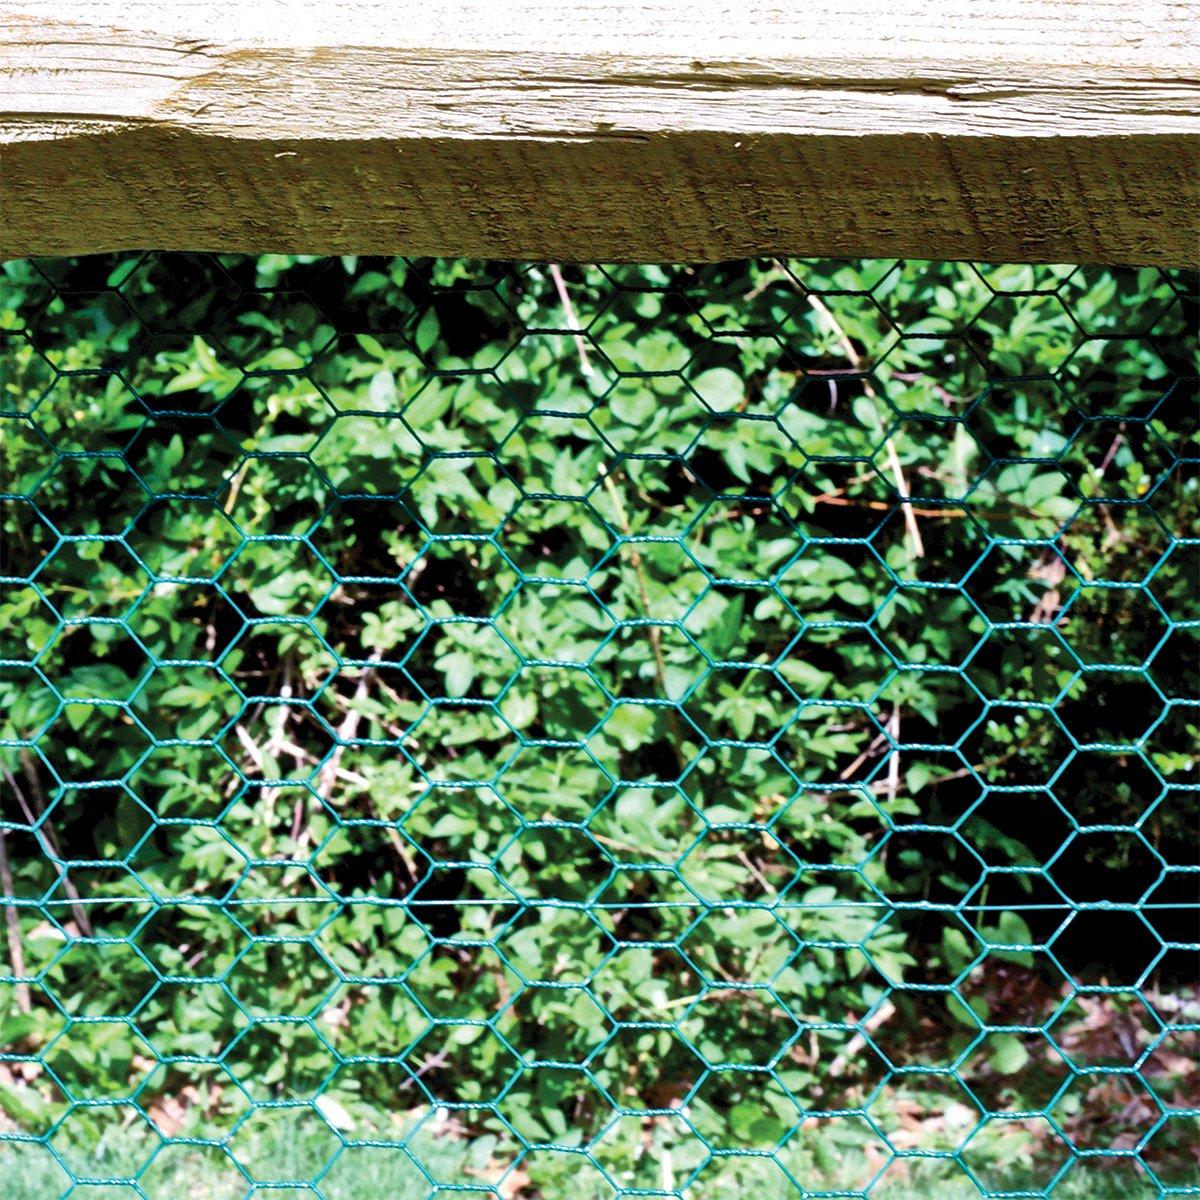 Garden Zone 24inx25ft 1in Green Vinyl Poultry Netting by Origin Point (Image #4)